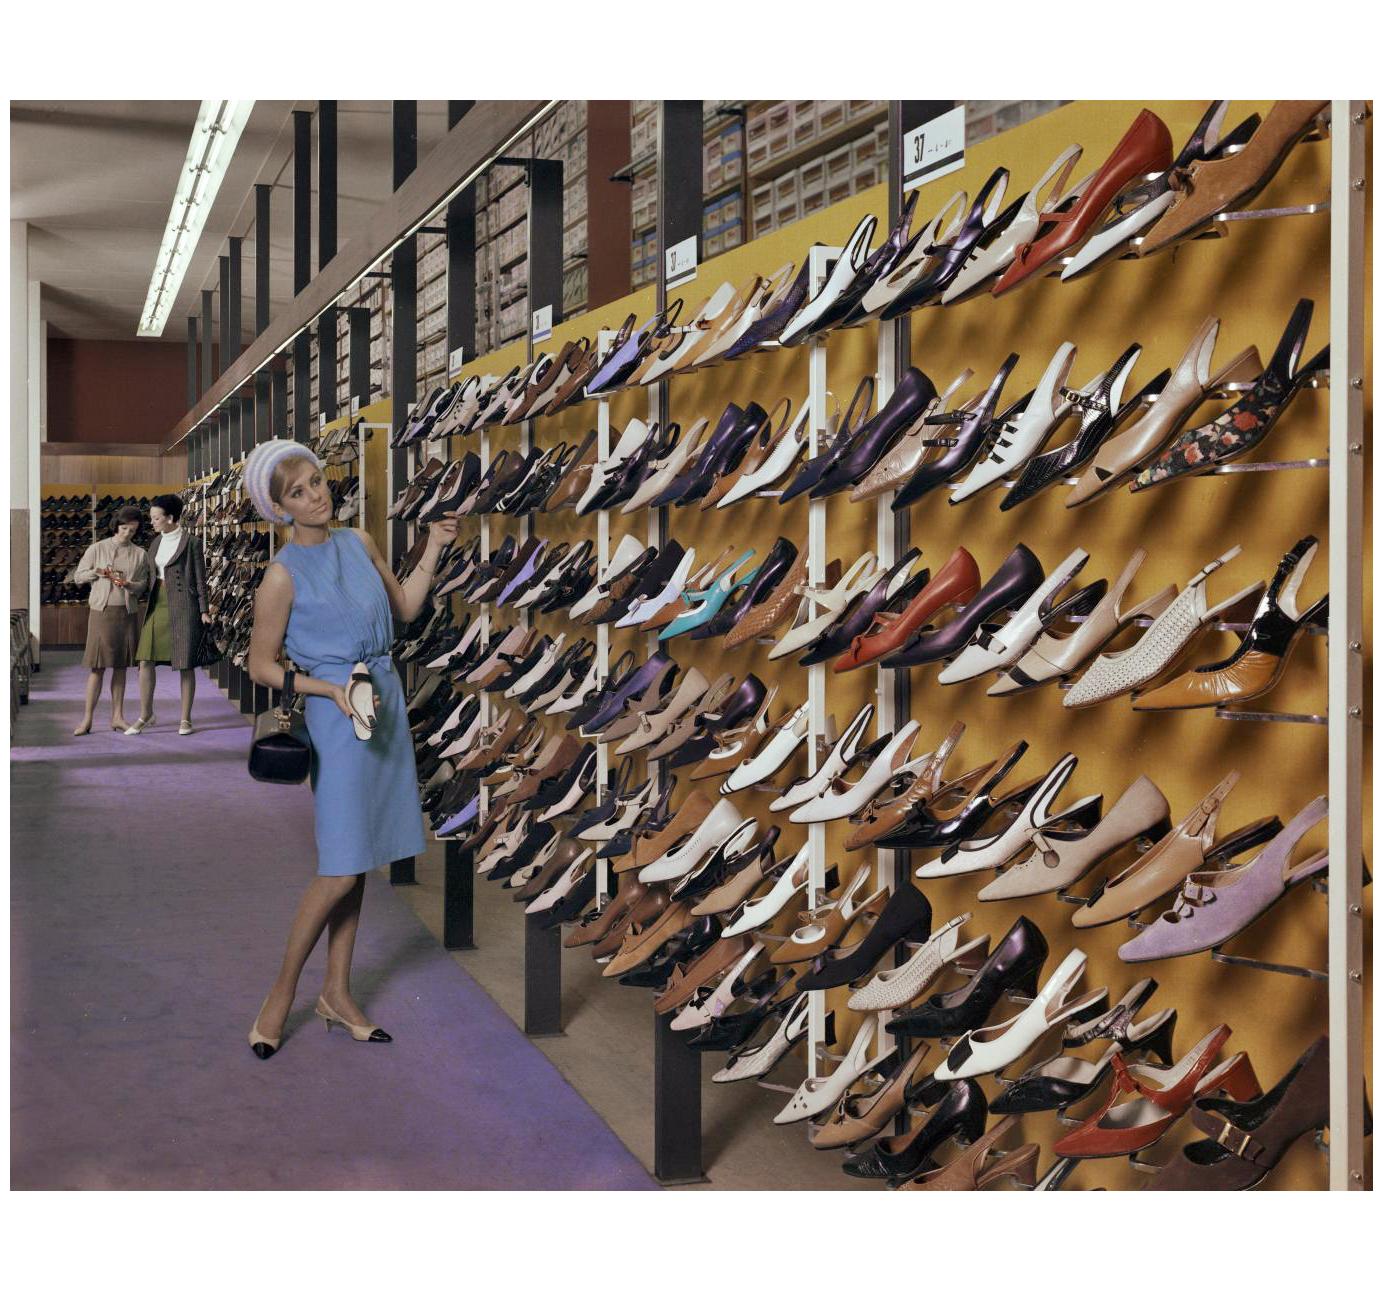 60s Pleasurephoto Pagina 200 Bettina Heels Netty Beige Amsterdam Model Shoe Shop 1966